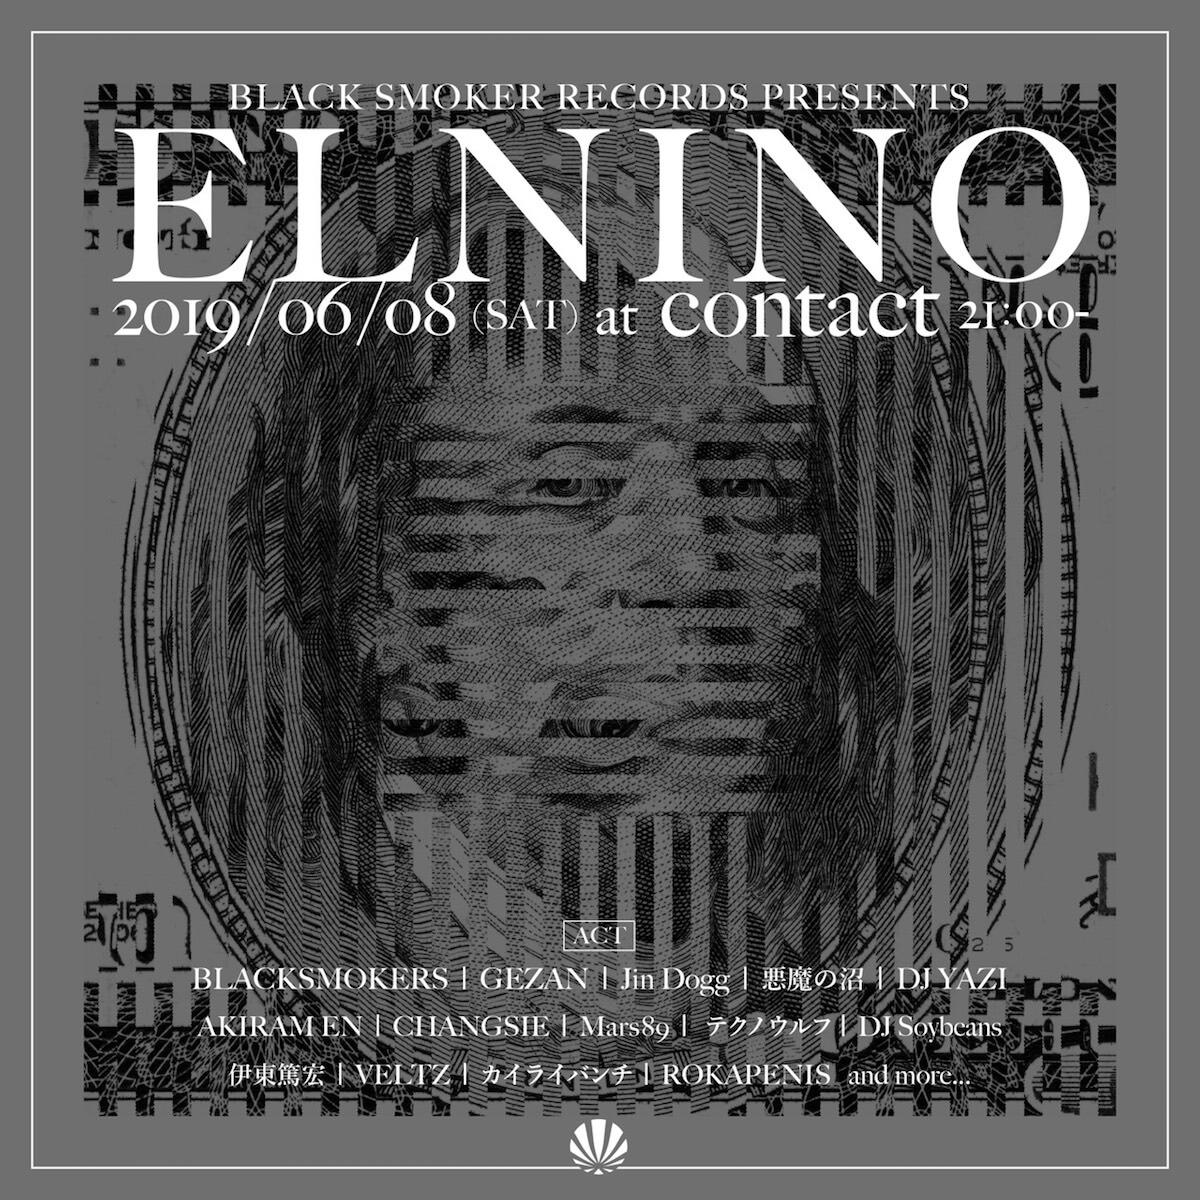 BLACK SMOKERによる「EL NINO」が2年ぶりに開催|GEZAN、Jin Dogg、悪魔の沼、Changsie、Mars89、AKIRAM ENらが登場 blacksmoker-elnino-190528